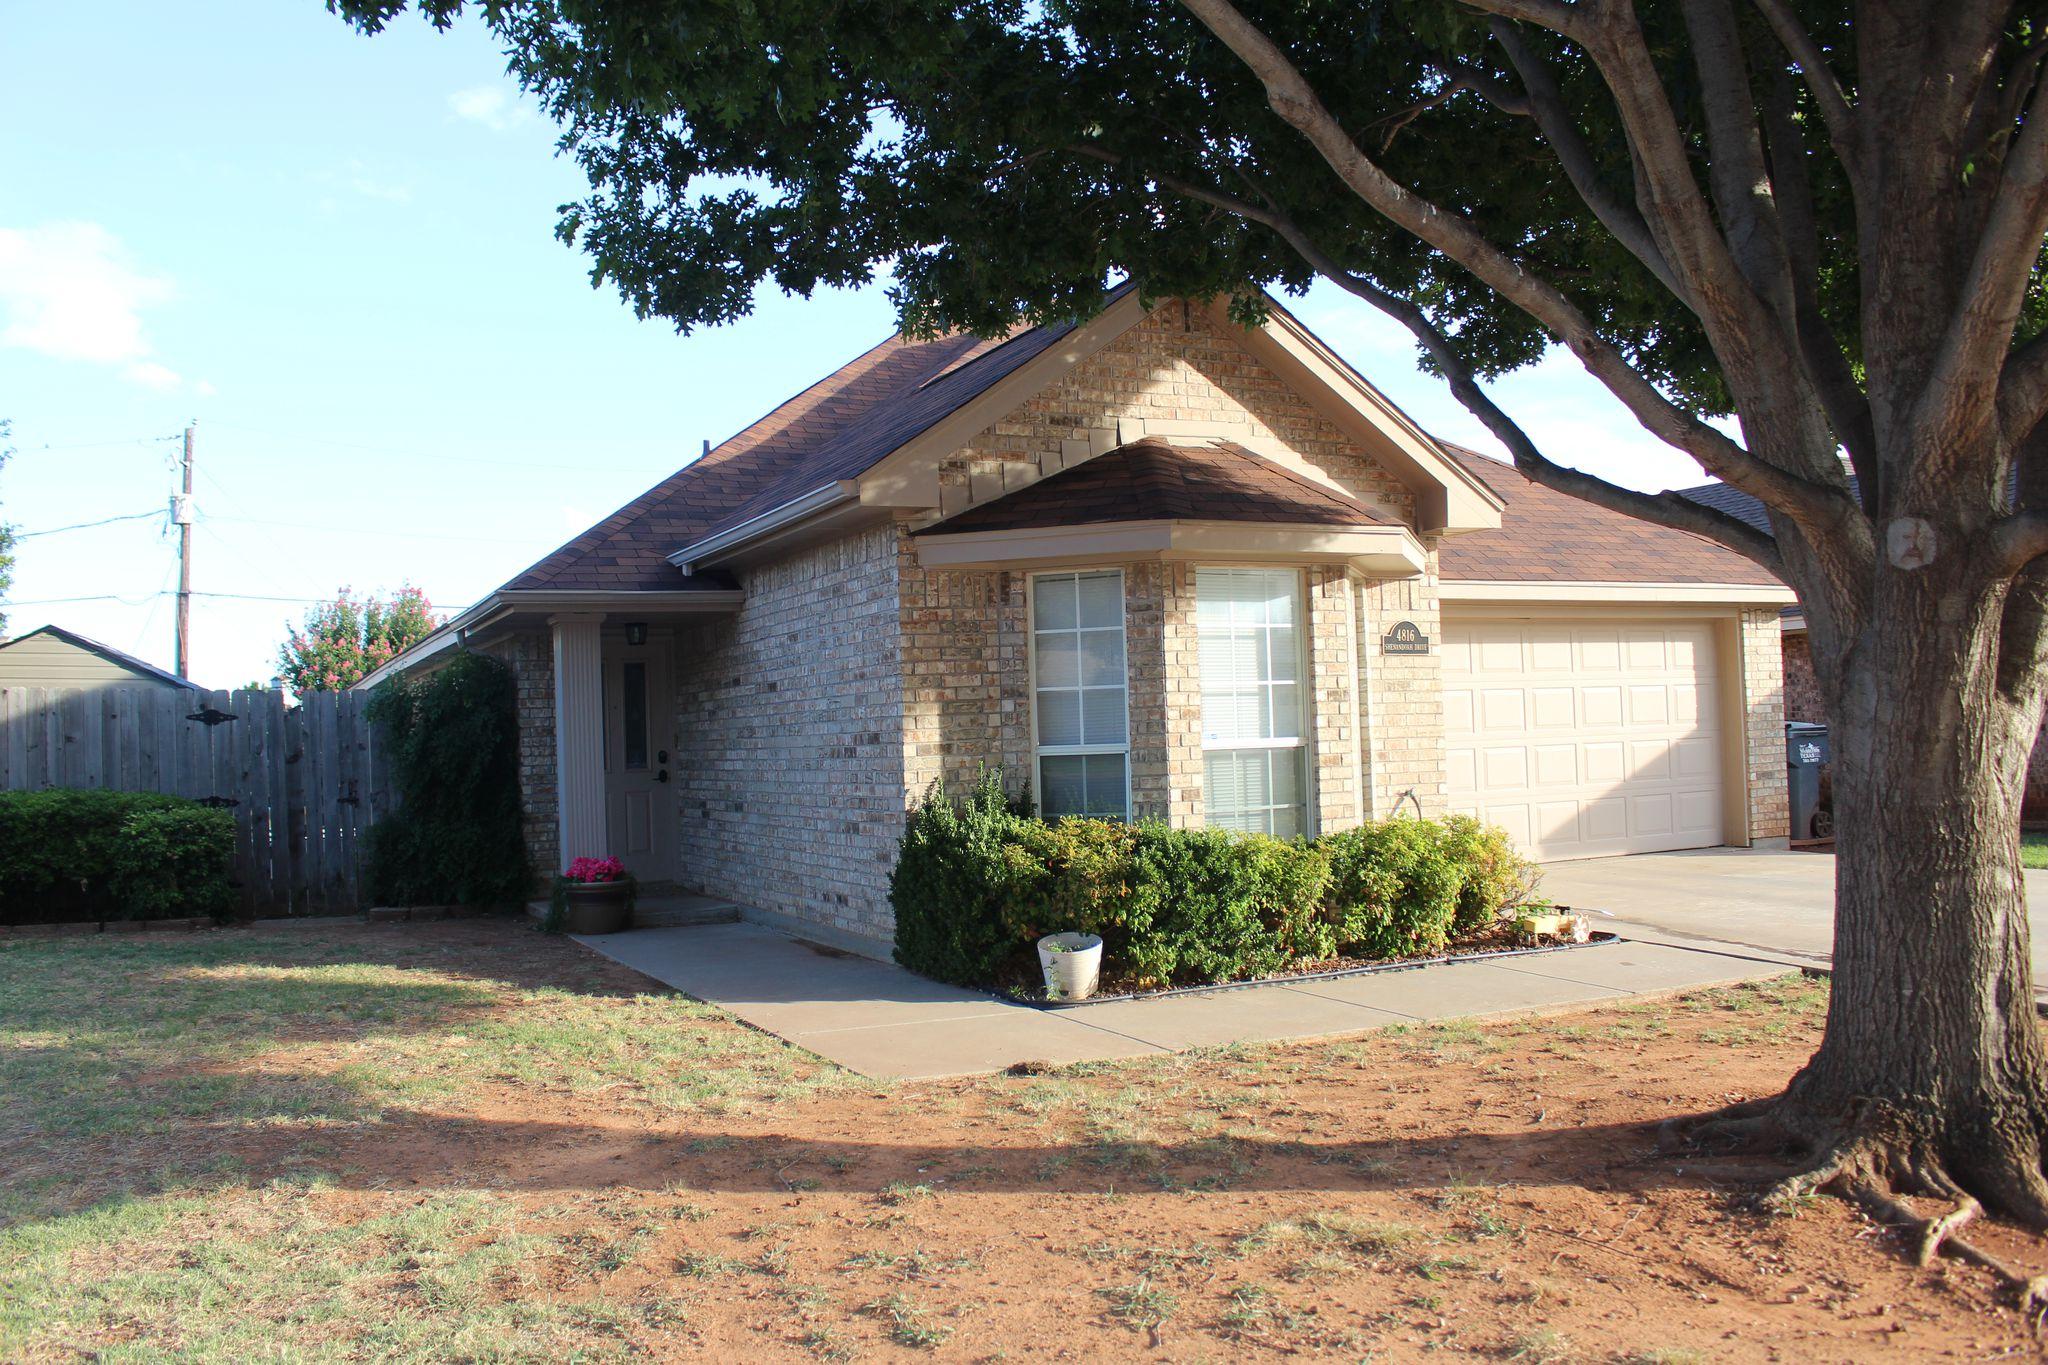 4816 Shenandoah Dr, Wichita Falls, TX 76310 - 3 Bed, 2 Bath Single